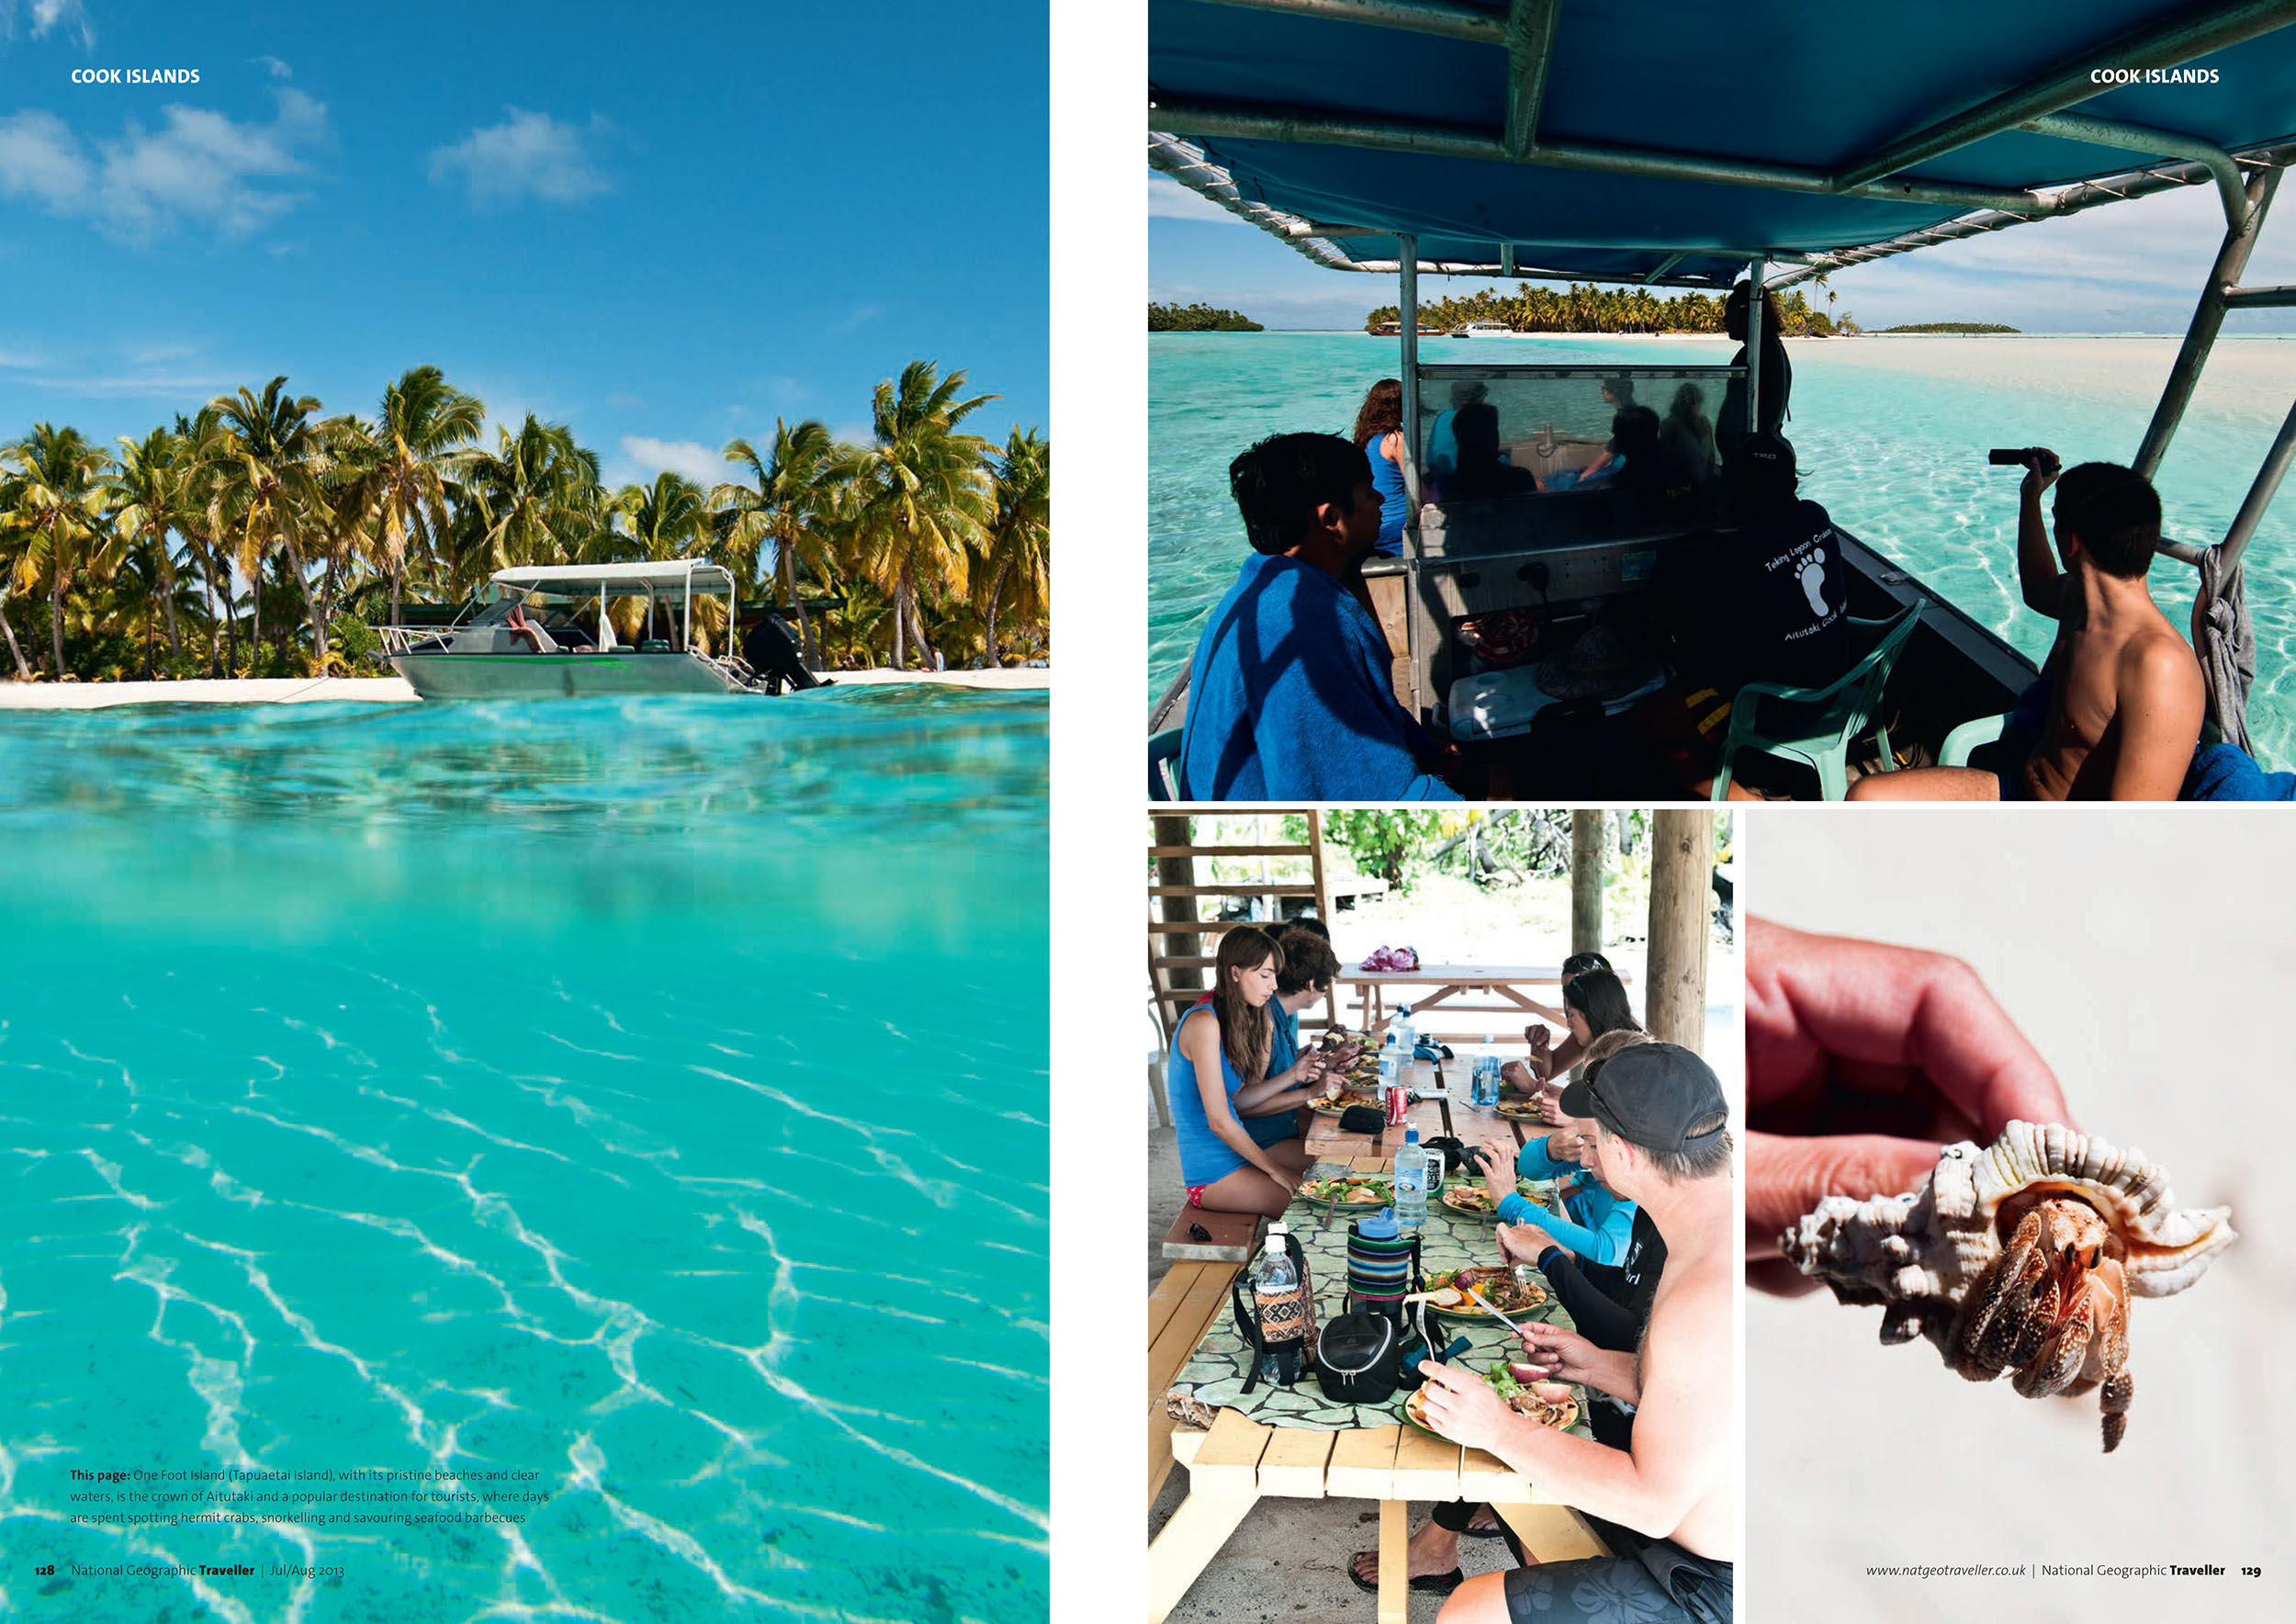 Pickard_20130701_National_Geographic_Traveller_Aitutaki_Island_003.jpg